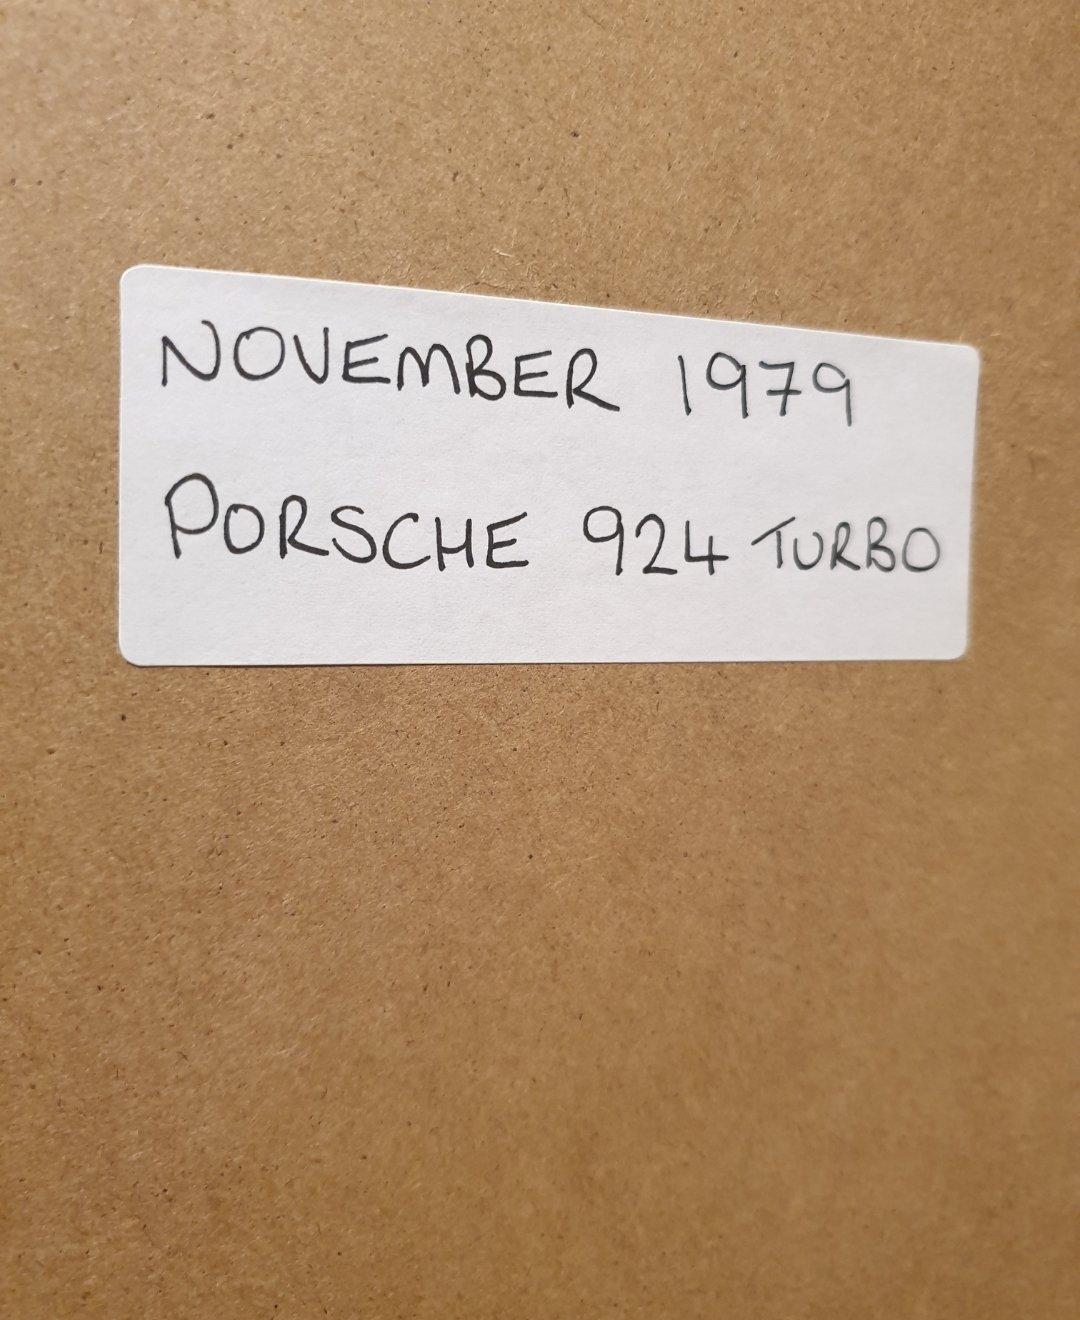 1979 Porsche 924 Turbo Framed Advert Original  For Sale (picture 2 of 2)